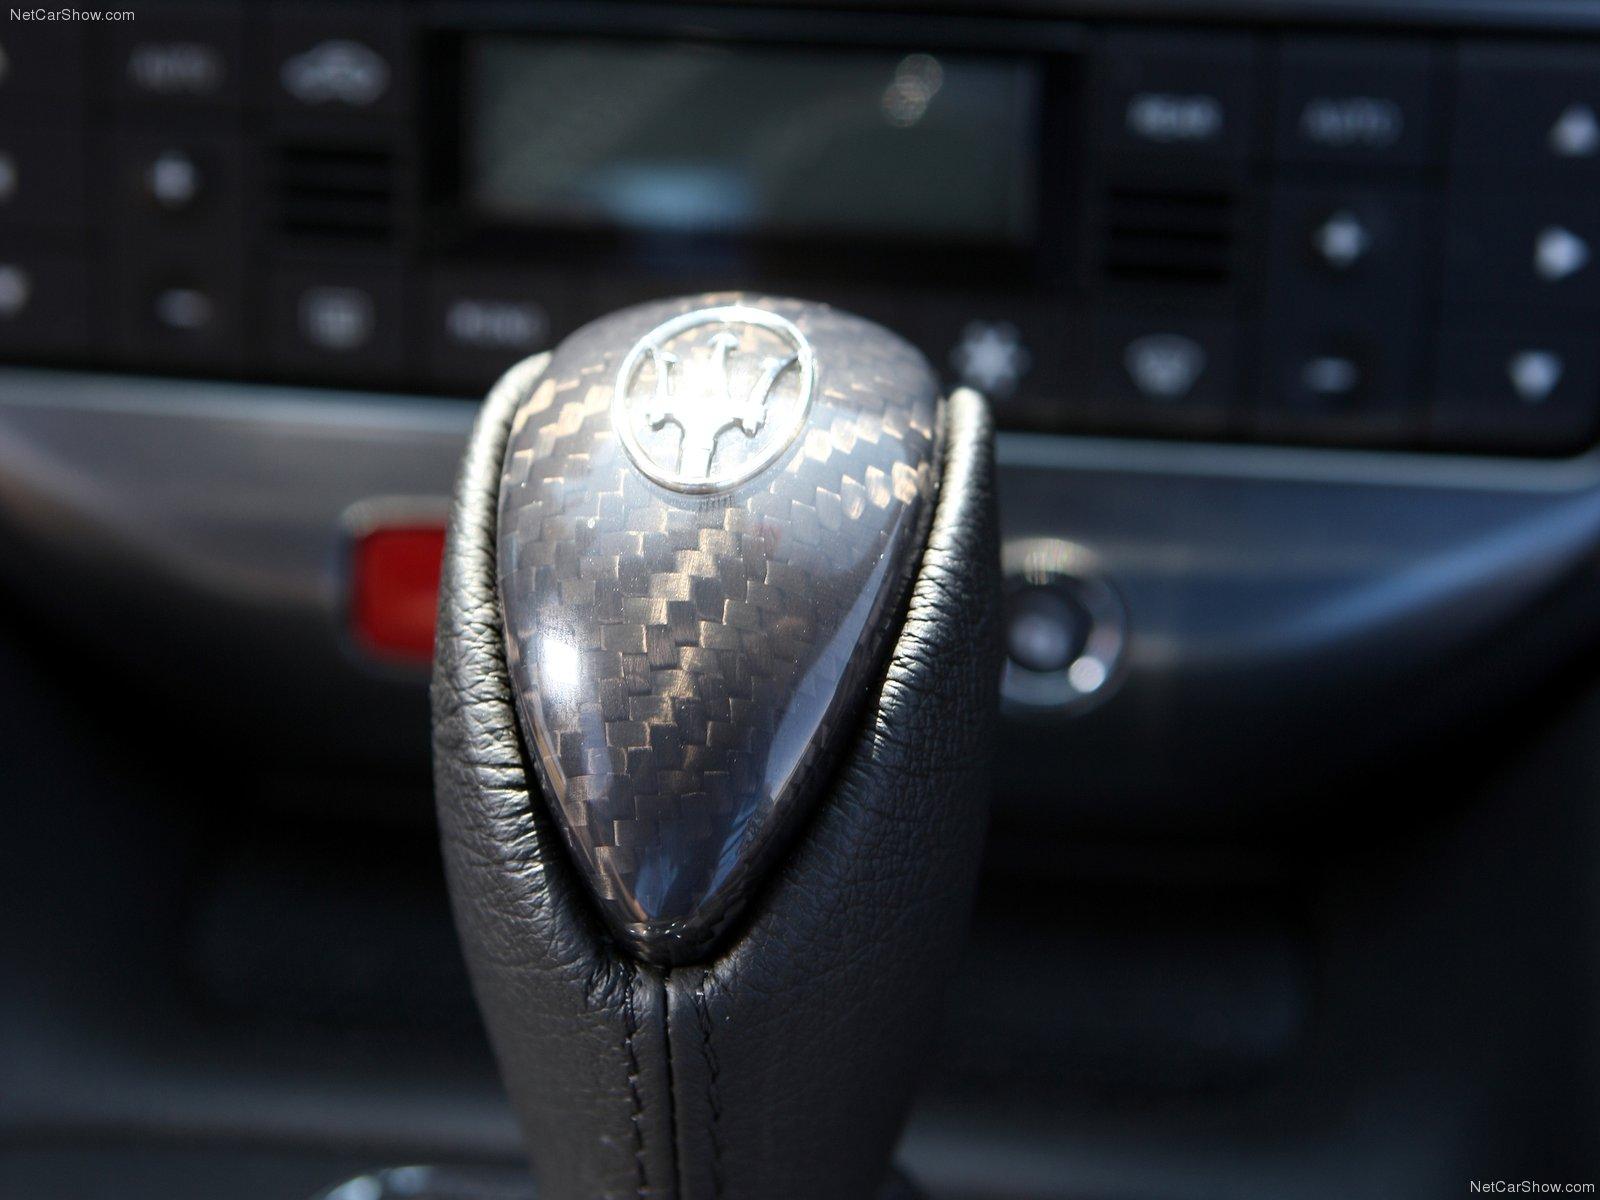 Hình ảnh siêu xe Maserati GranTurismo S Automatic 2010 & nội ngoại thất